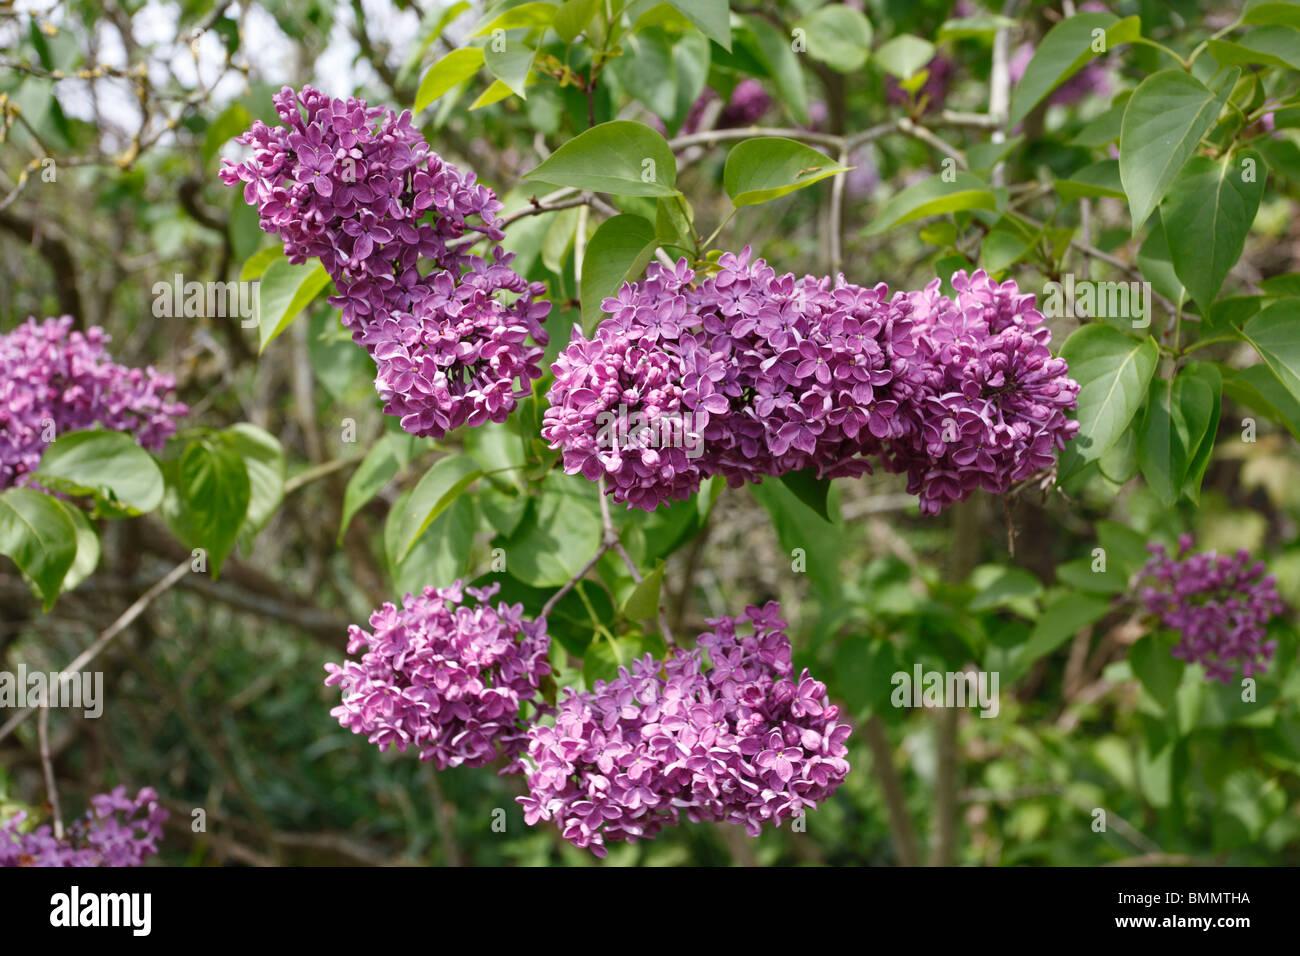 Common lilac (Syringa vulgaris) shrub in flower - Stock Image